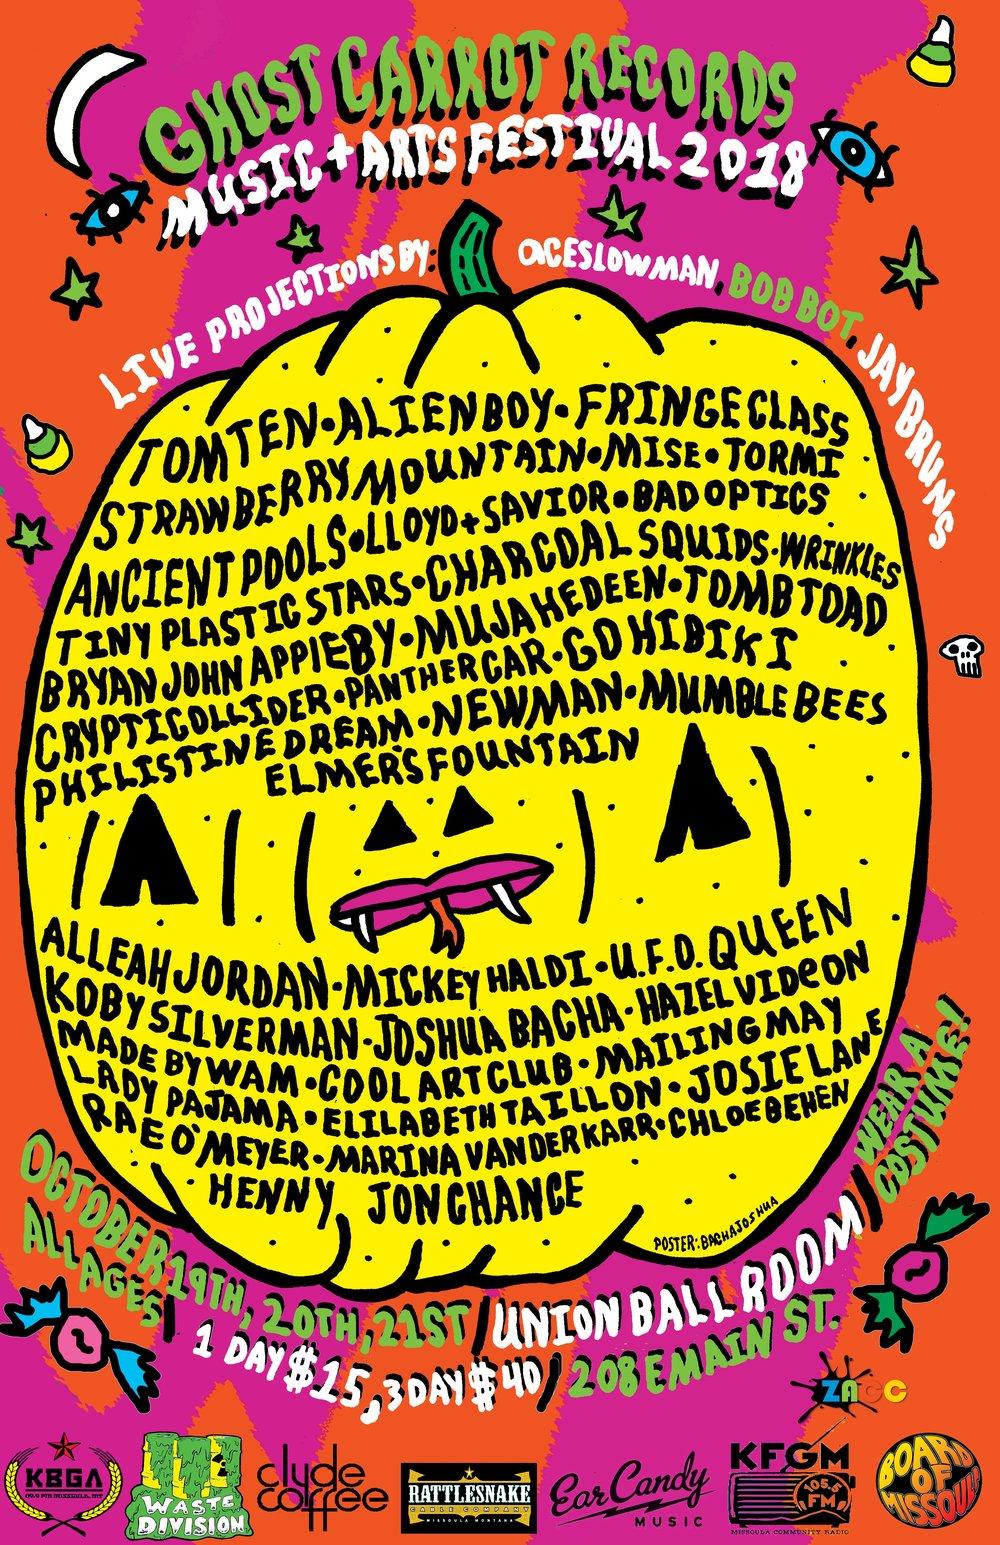 Poster by Joshua Bacha